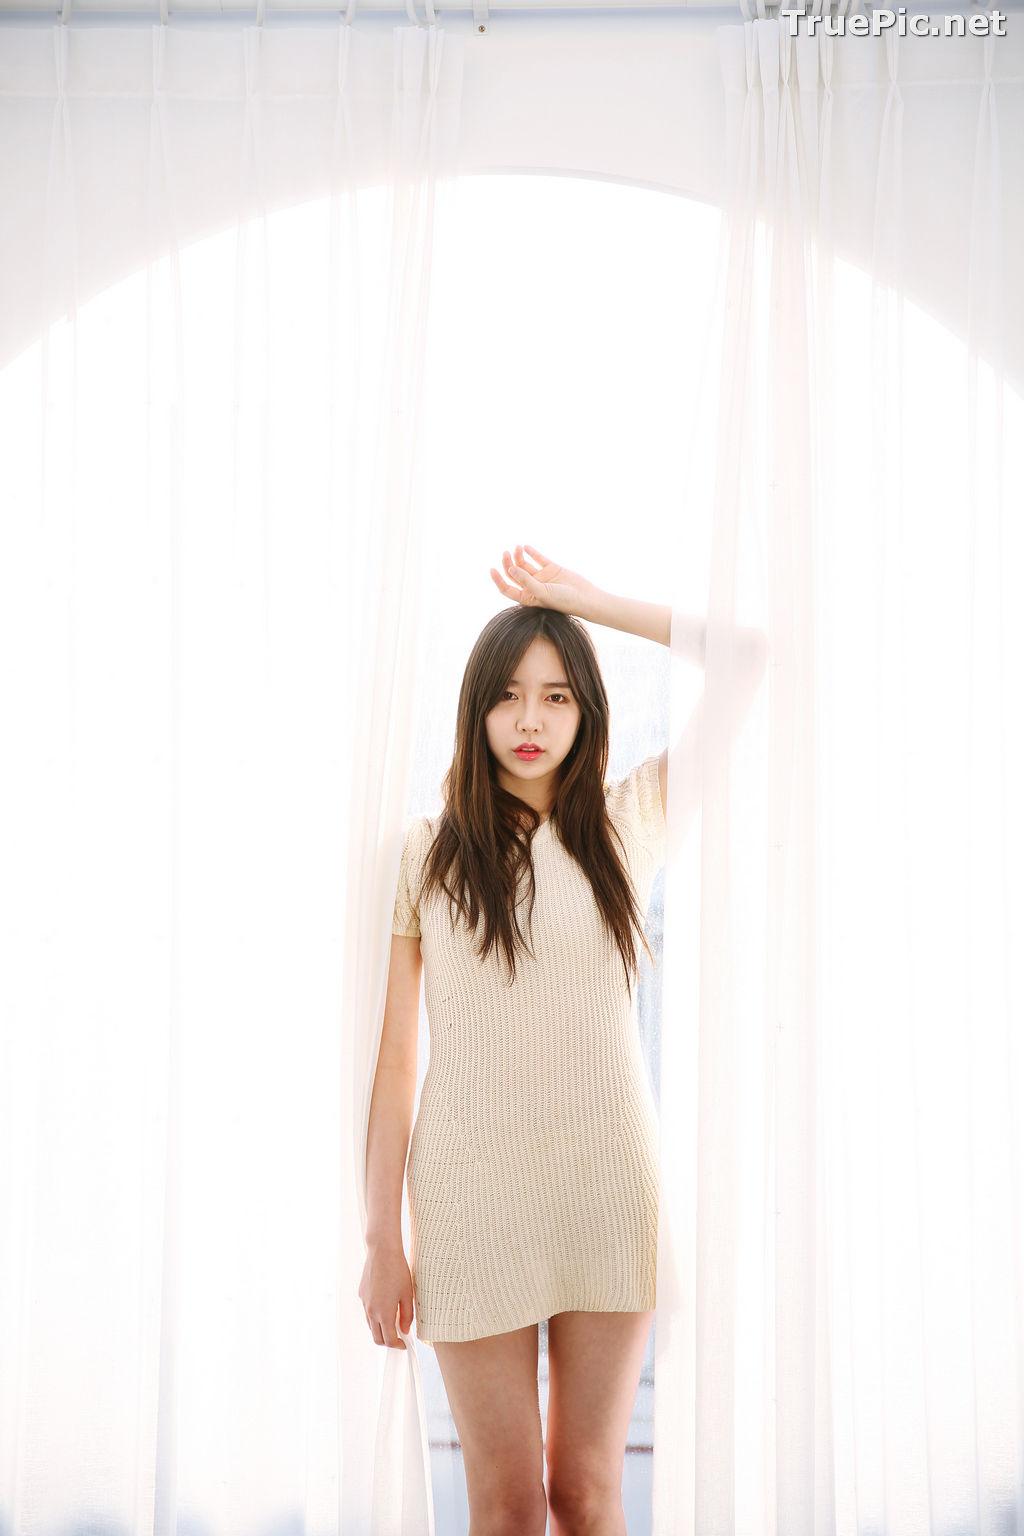 Image Korean Model – Ga-Eun (고은) – Cute and Hot Sexy Angel #2 - TruePic.net - Picture-13